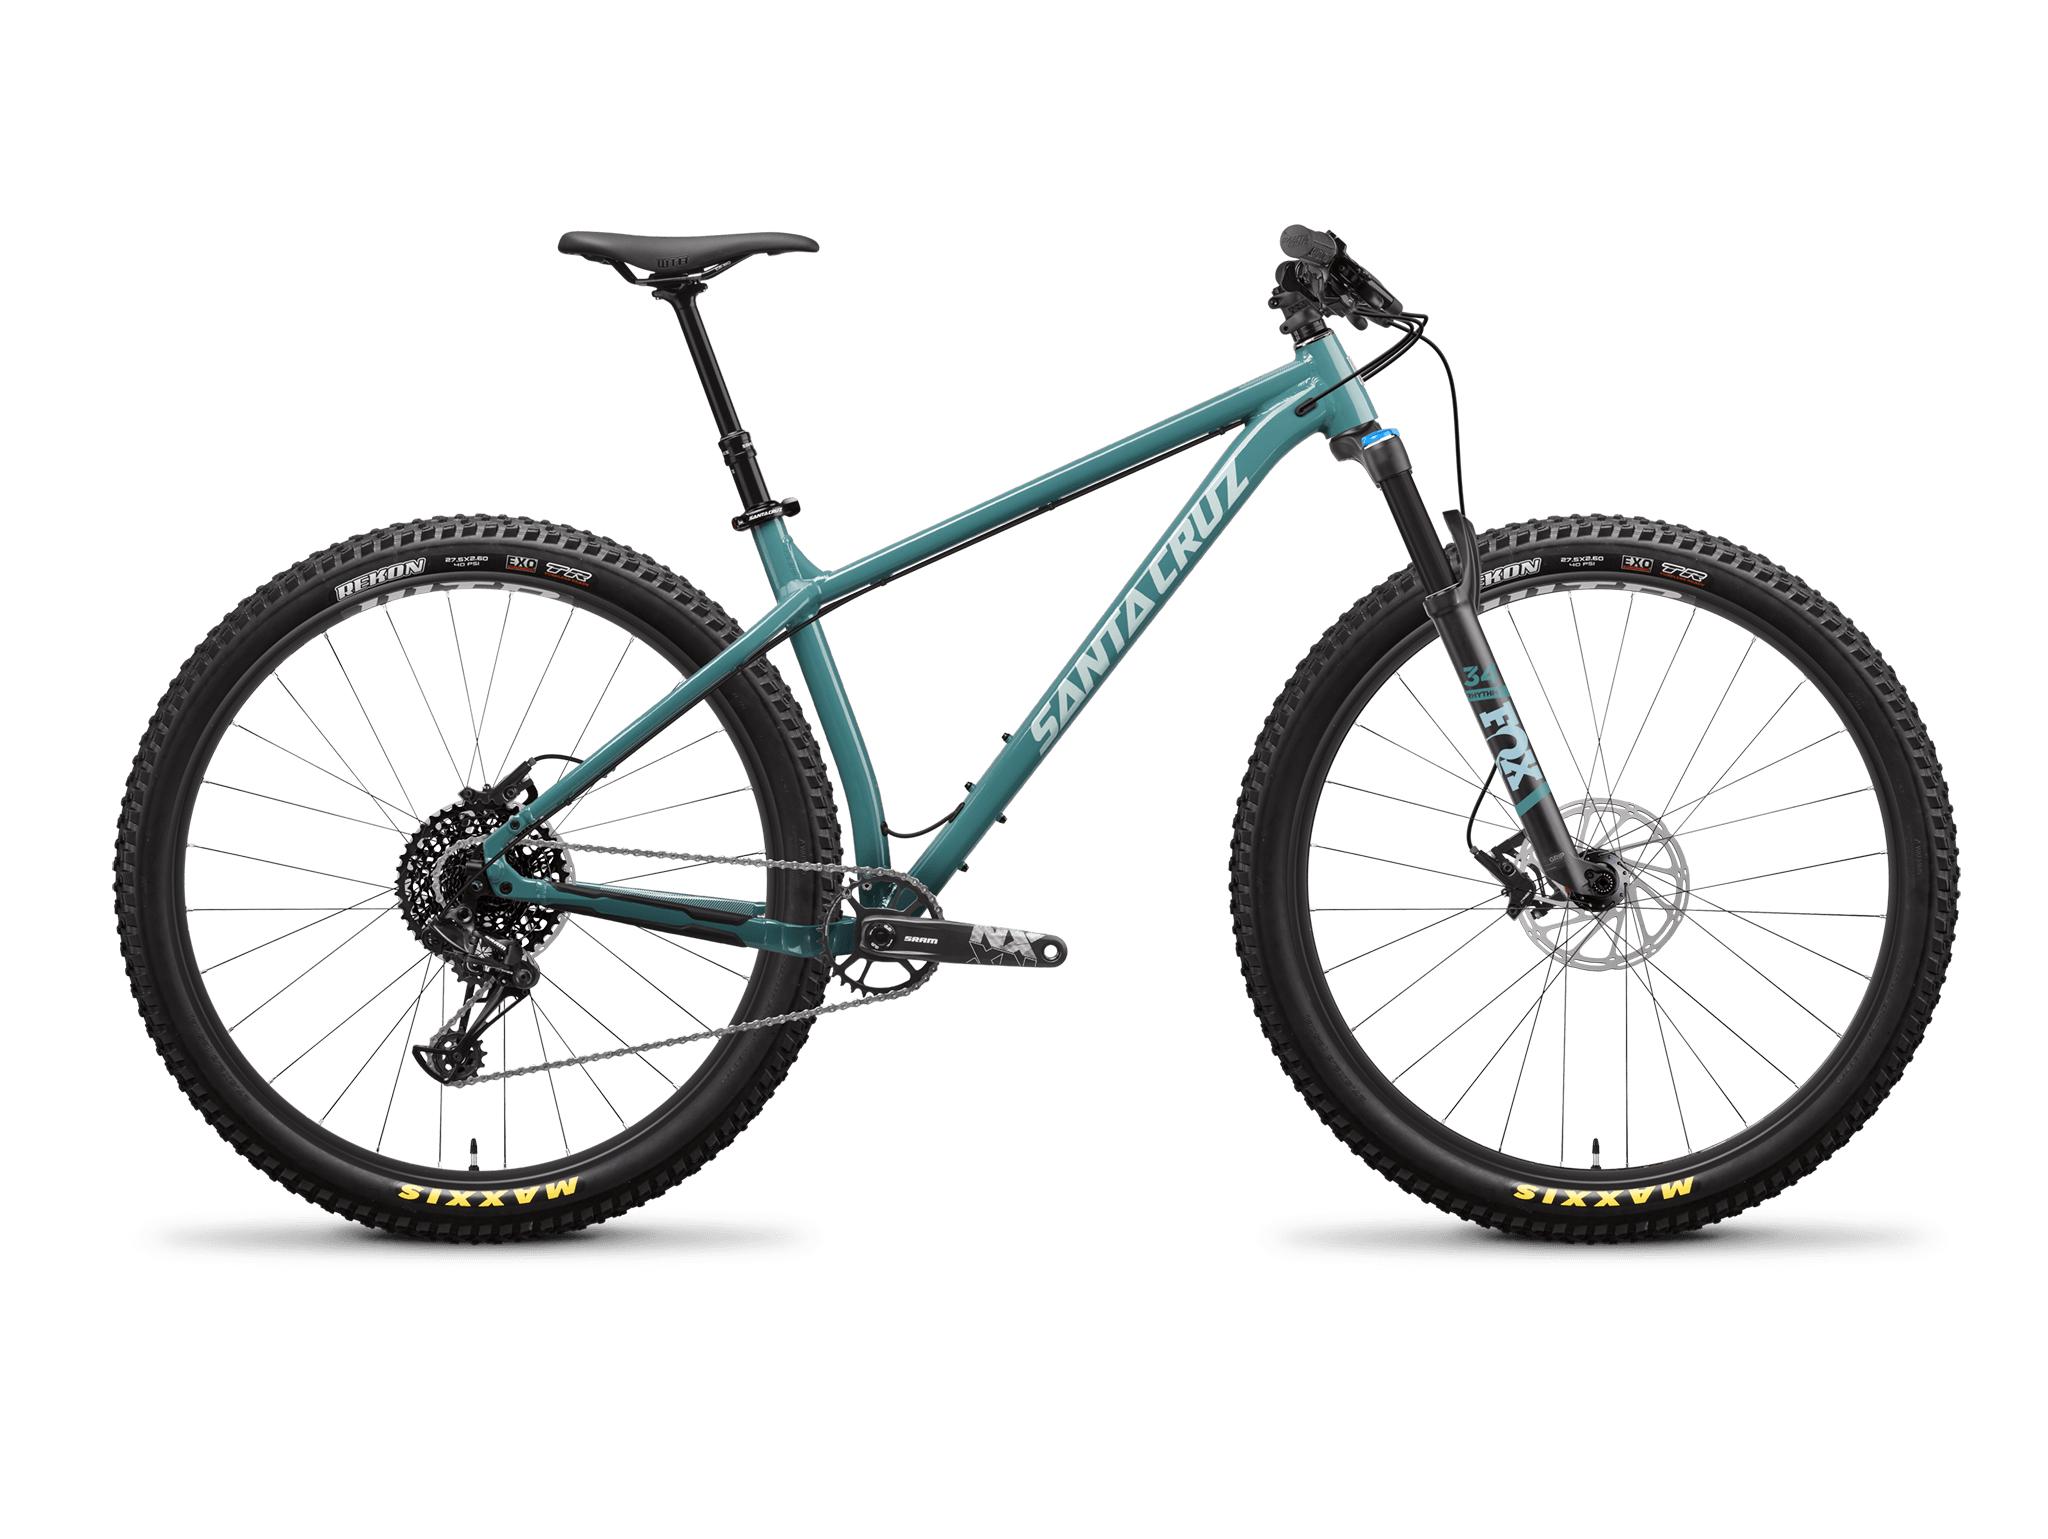 santa-cruz-chameleon-hardtail-mountain-bike